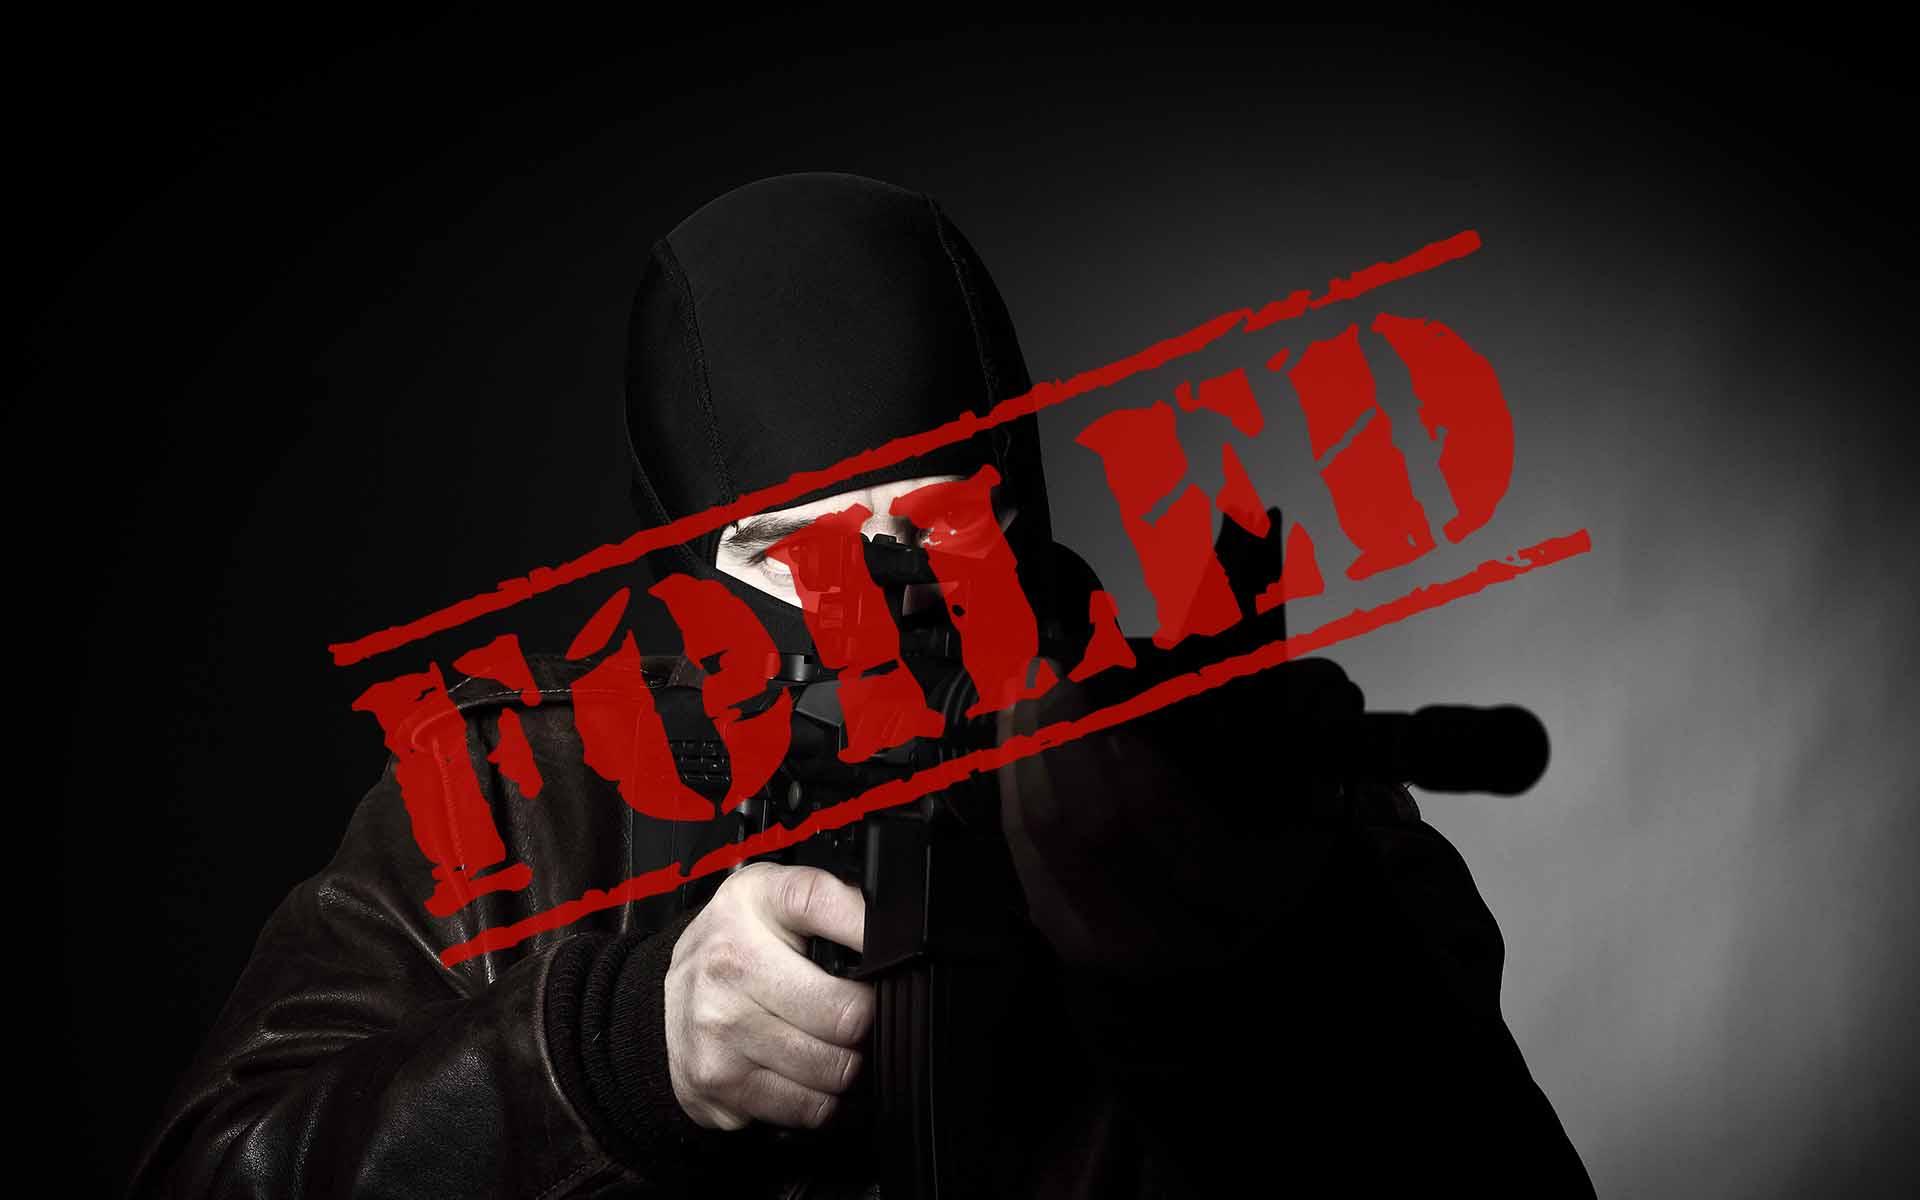 Assassination Attempt: Greek Law Enforcement Foil Plot to Kill Suspected Cryptocurrency Criminal, Alexander Vinnik